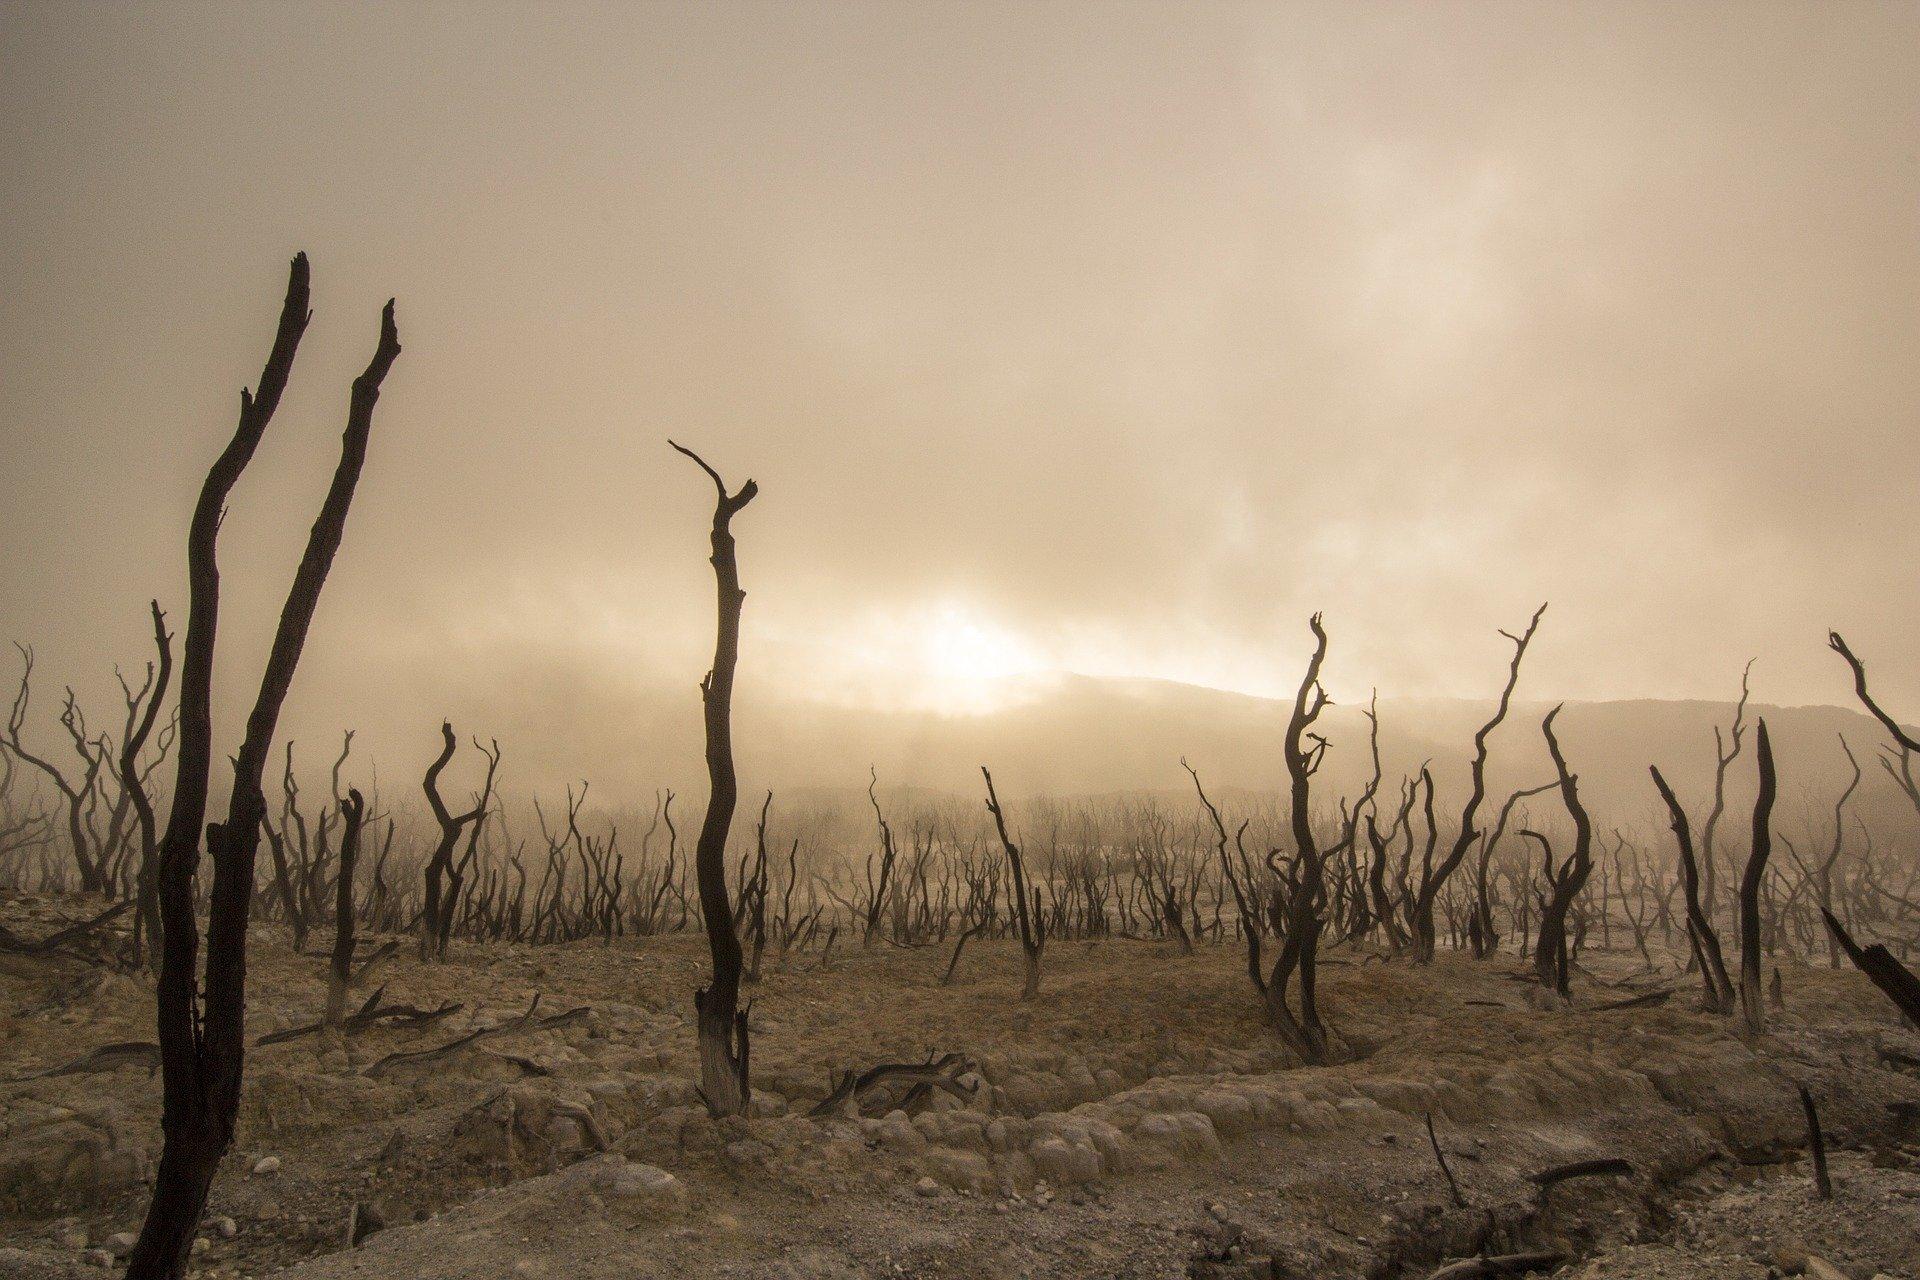 40 ans de climato-scepticisme